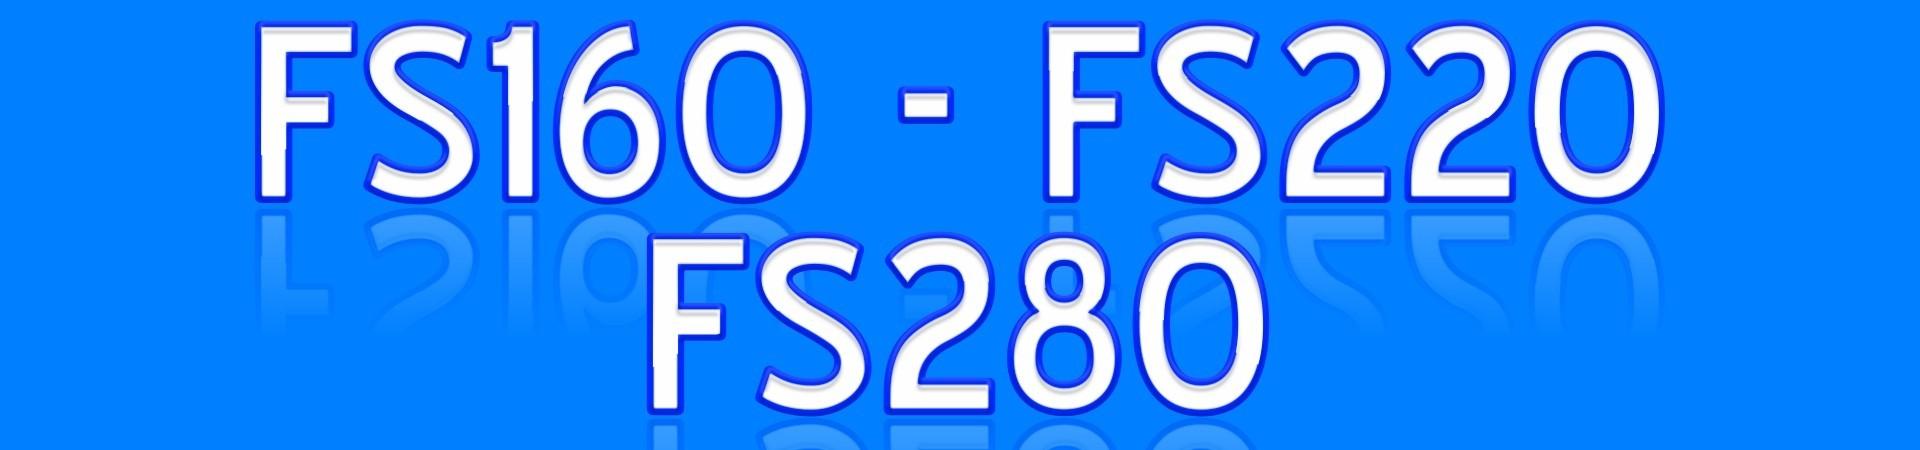 REPUESTOS para Desbrozadora STIHL FS160 FS220 FS280